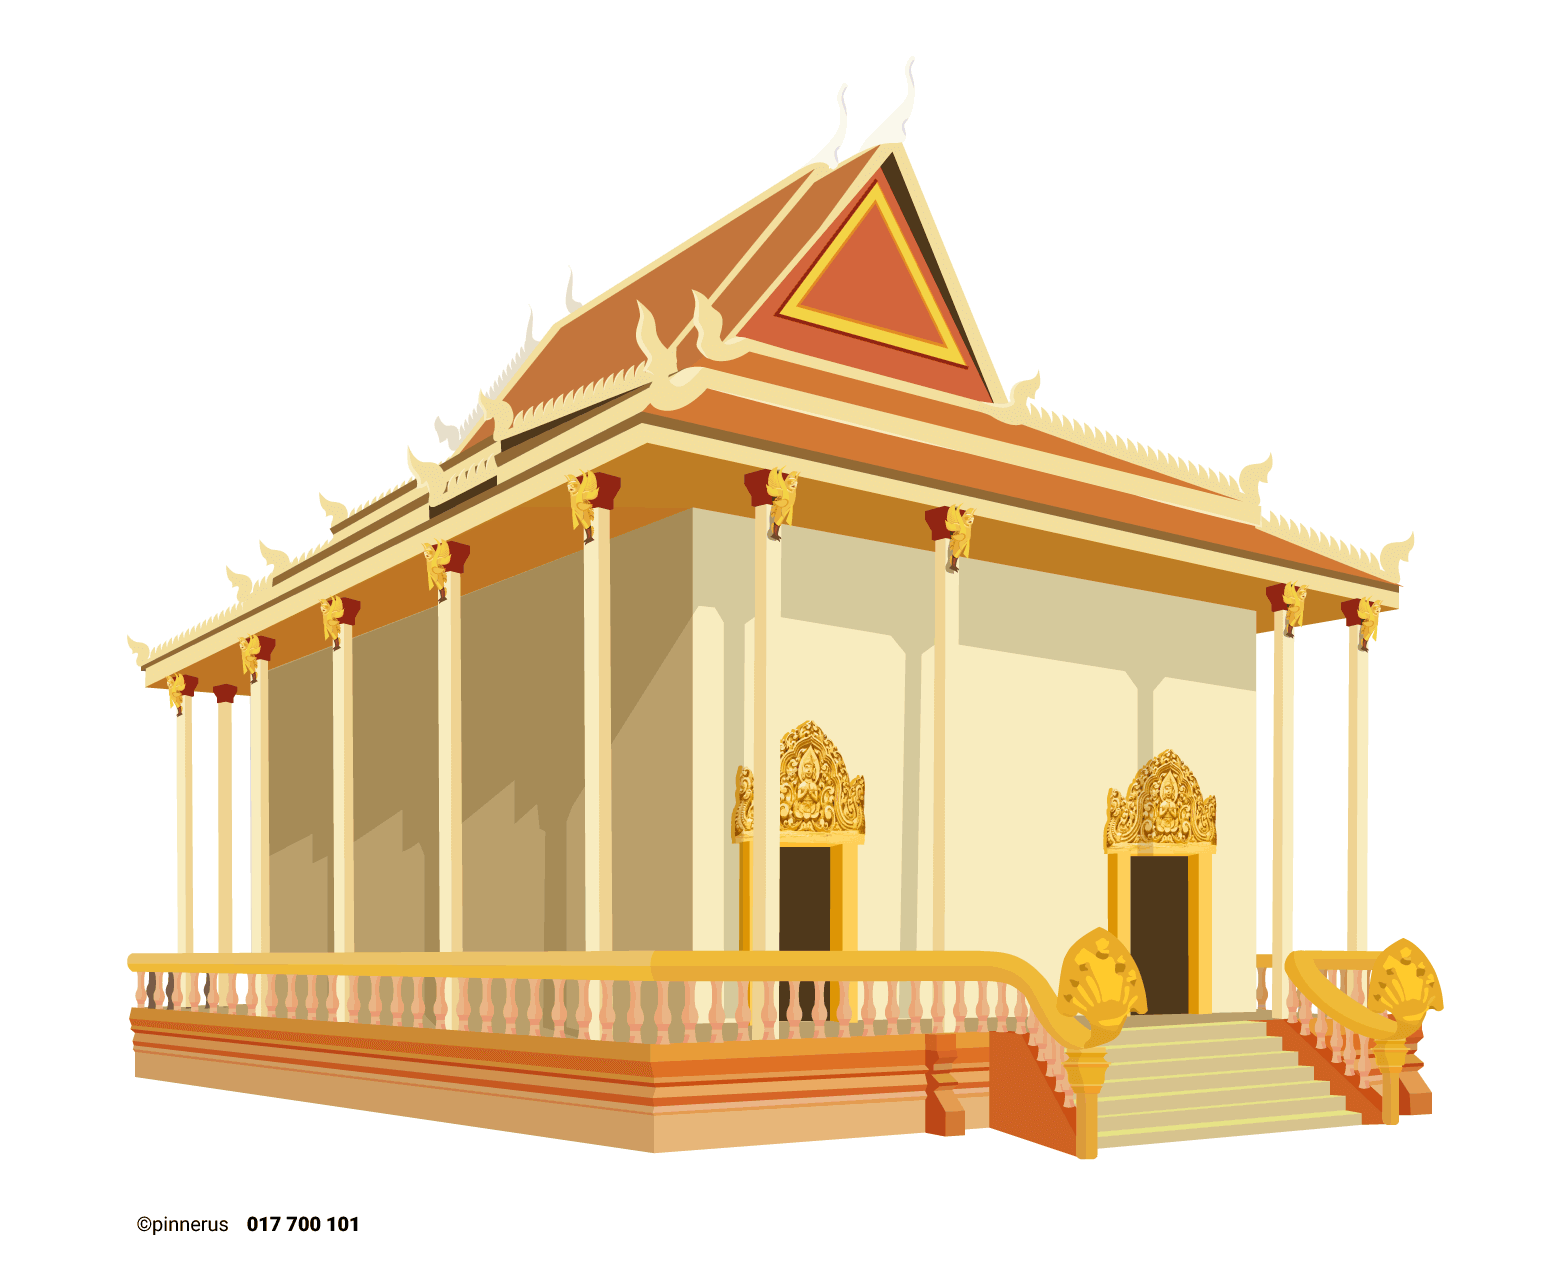 graphic free download Khmer pagoda illustration